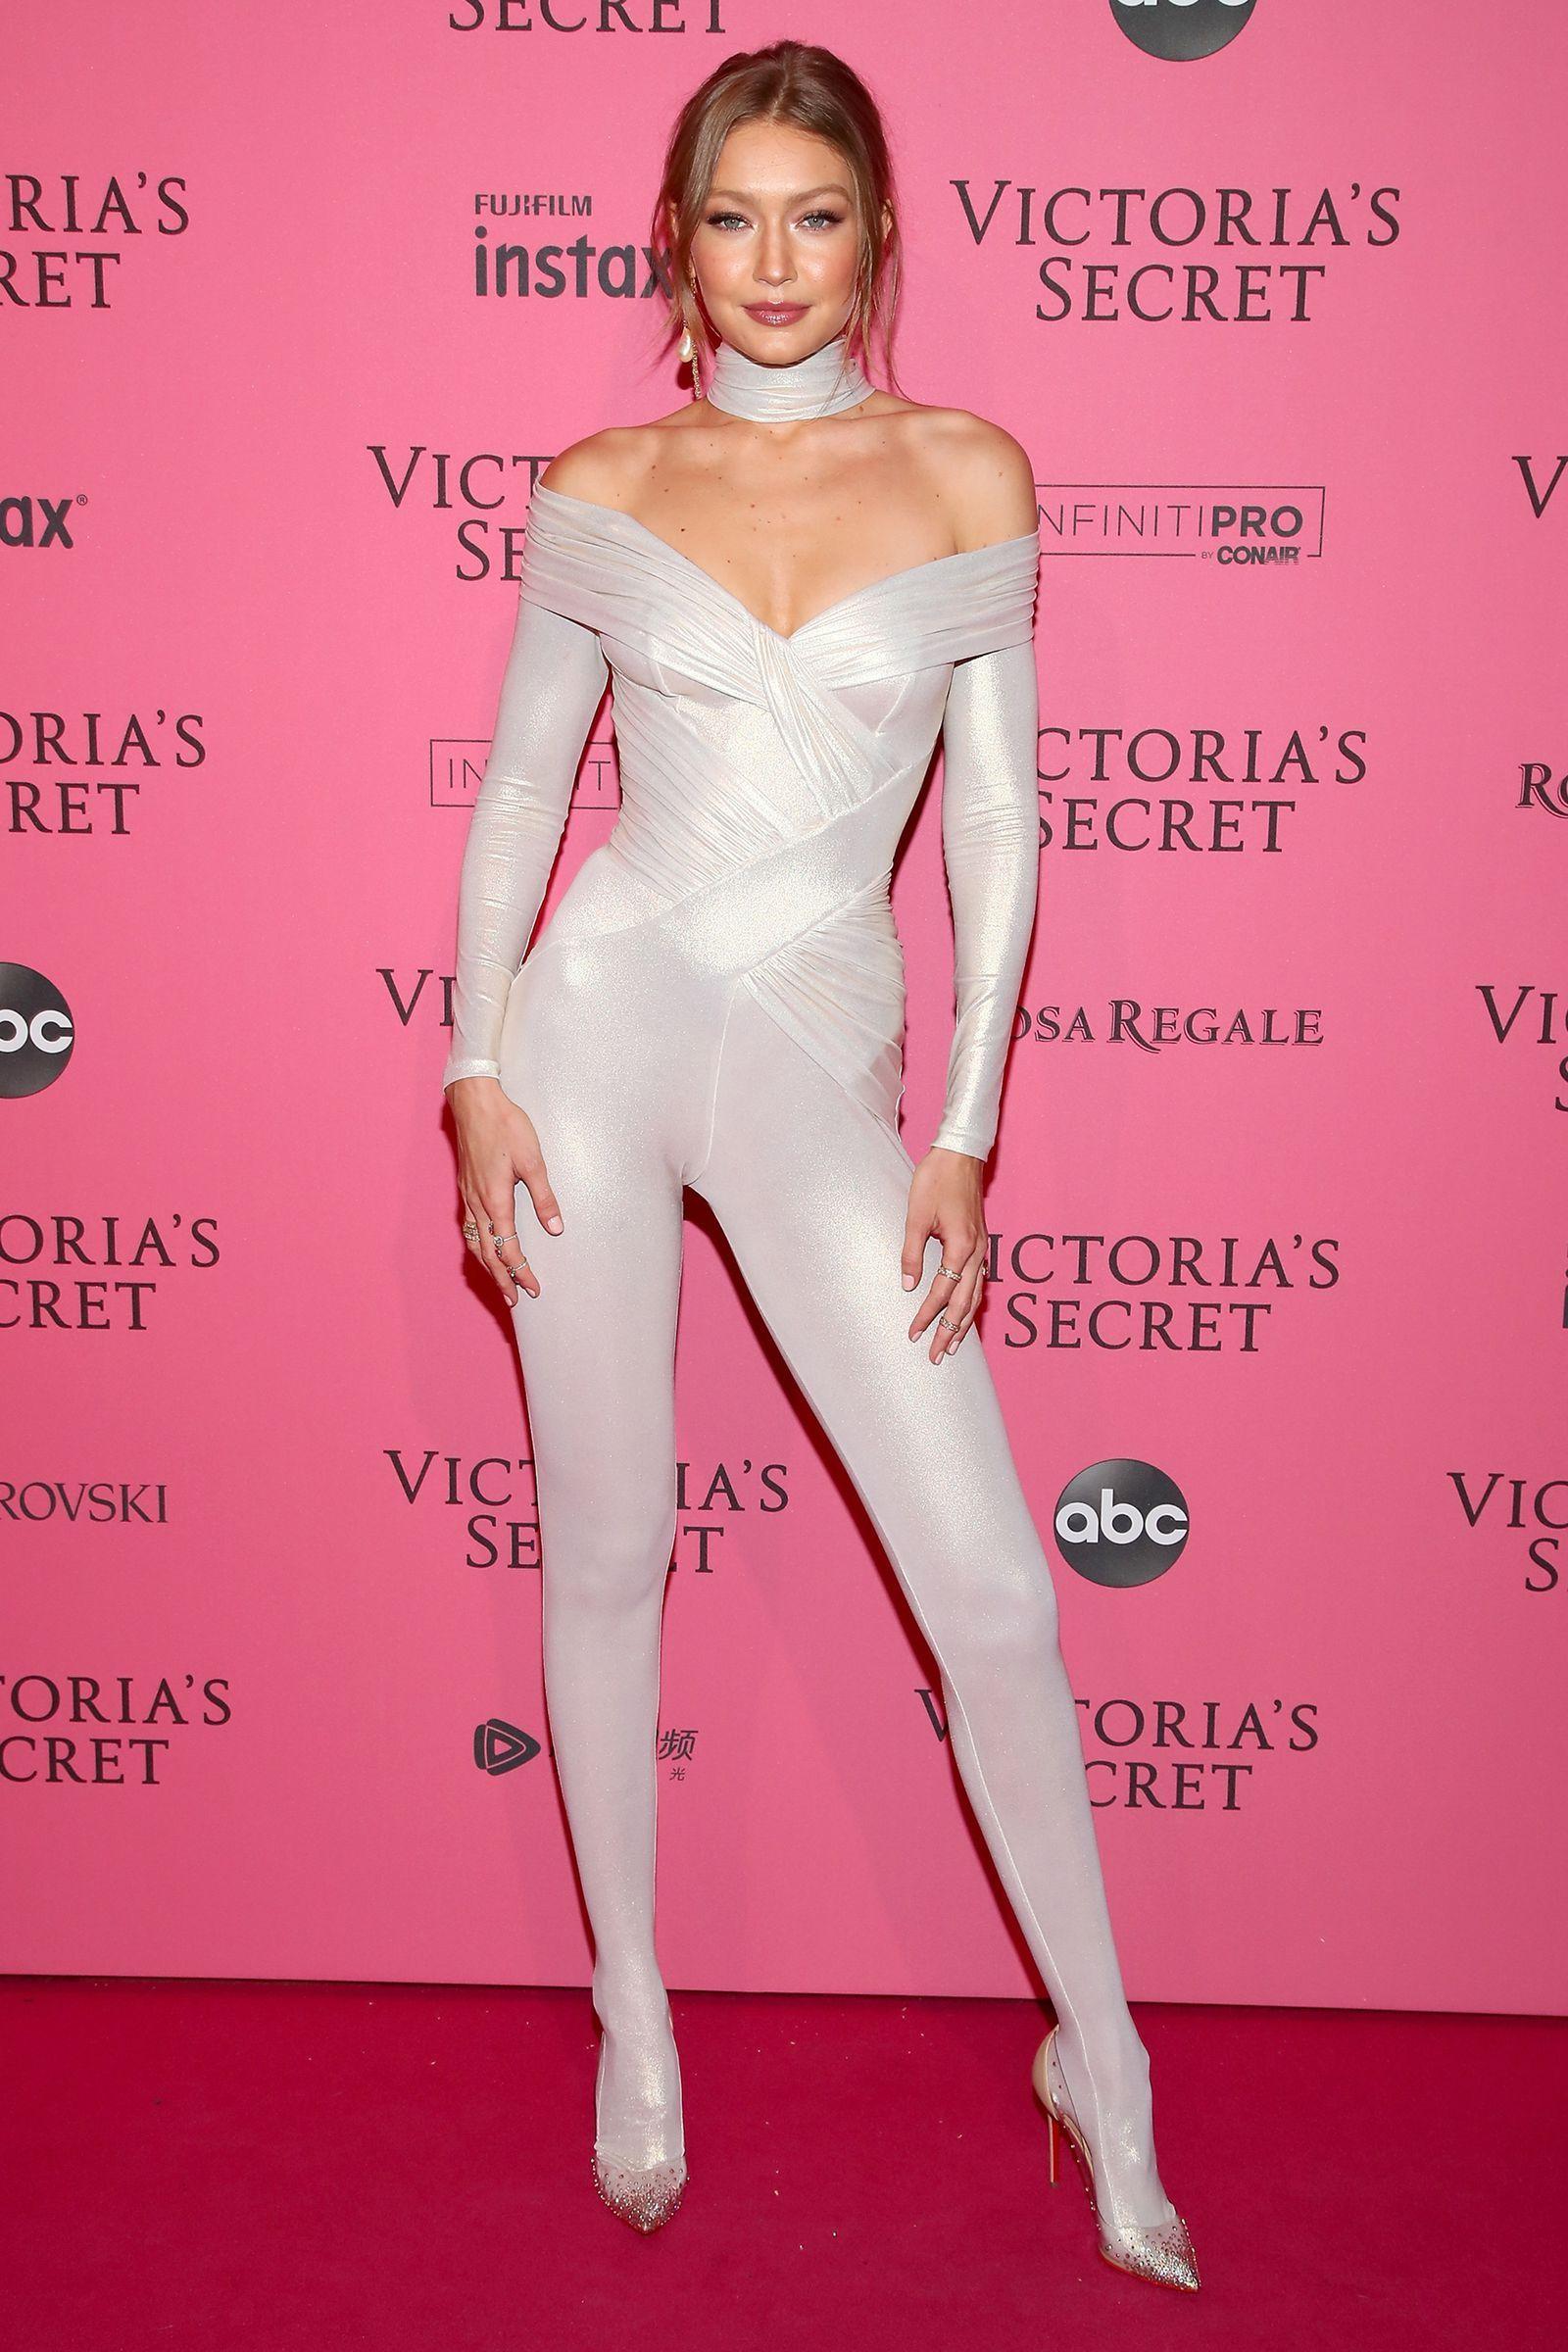 Gigi Hadid Won The Victoria S Secret After Party Red Carpet Gigi Hadid Victoria Secret Victoria Secret Fashion Show Gigi Hadid Outfits [ 2400 x 1600 Pixel ]